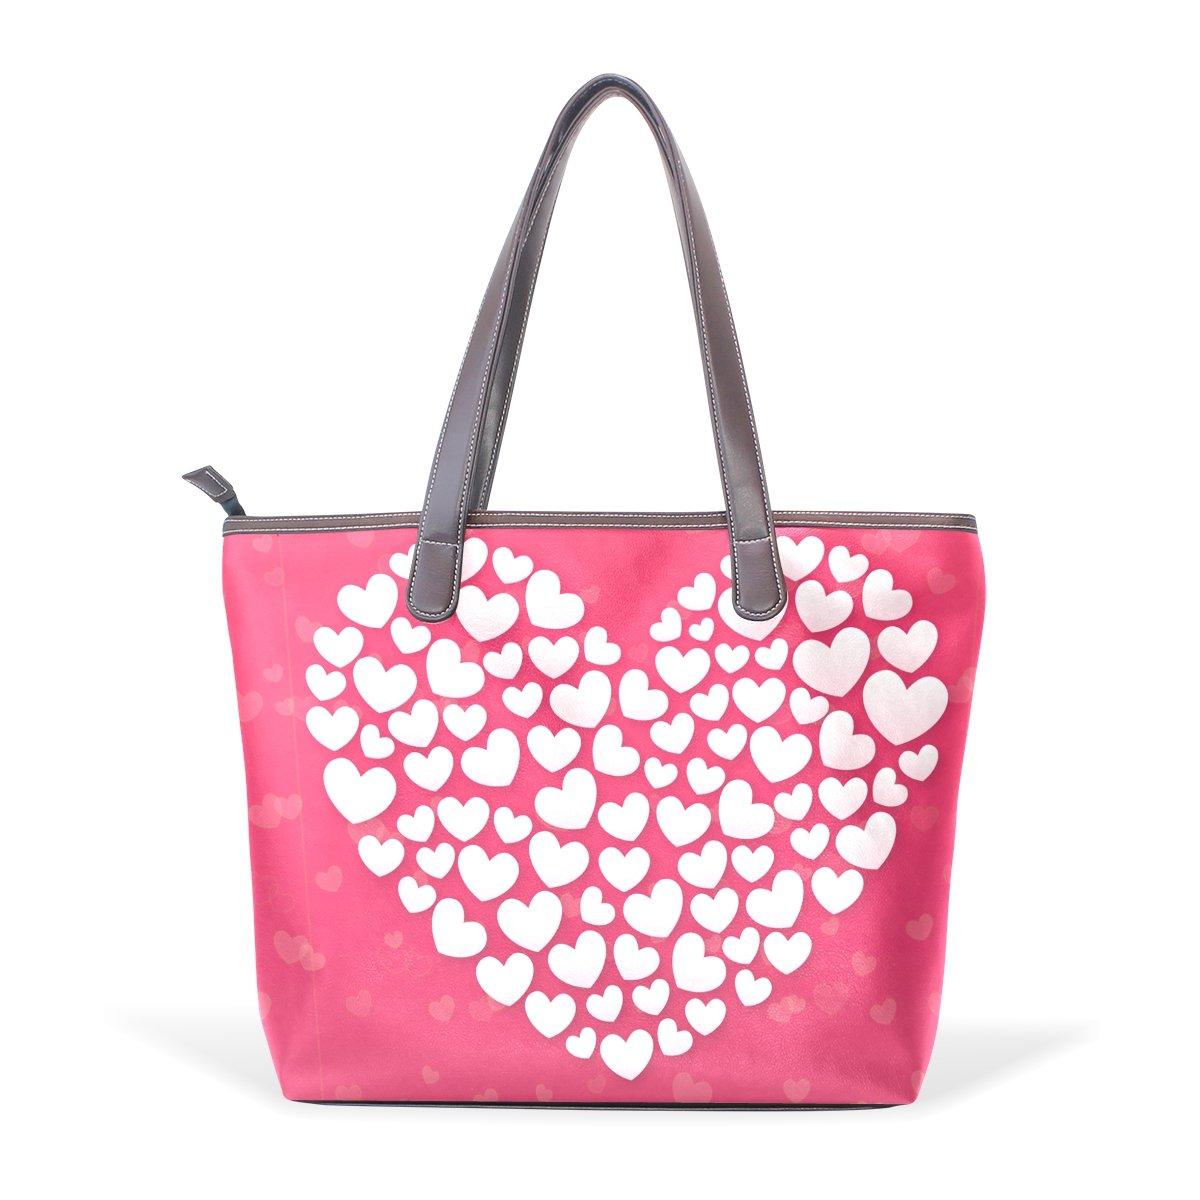 Happy Valentines Day Womens Fashion Large Shoulder Bag Handbag Tote Purse for Lady